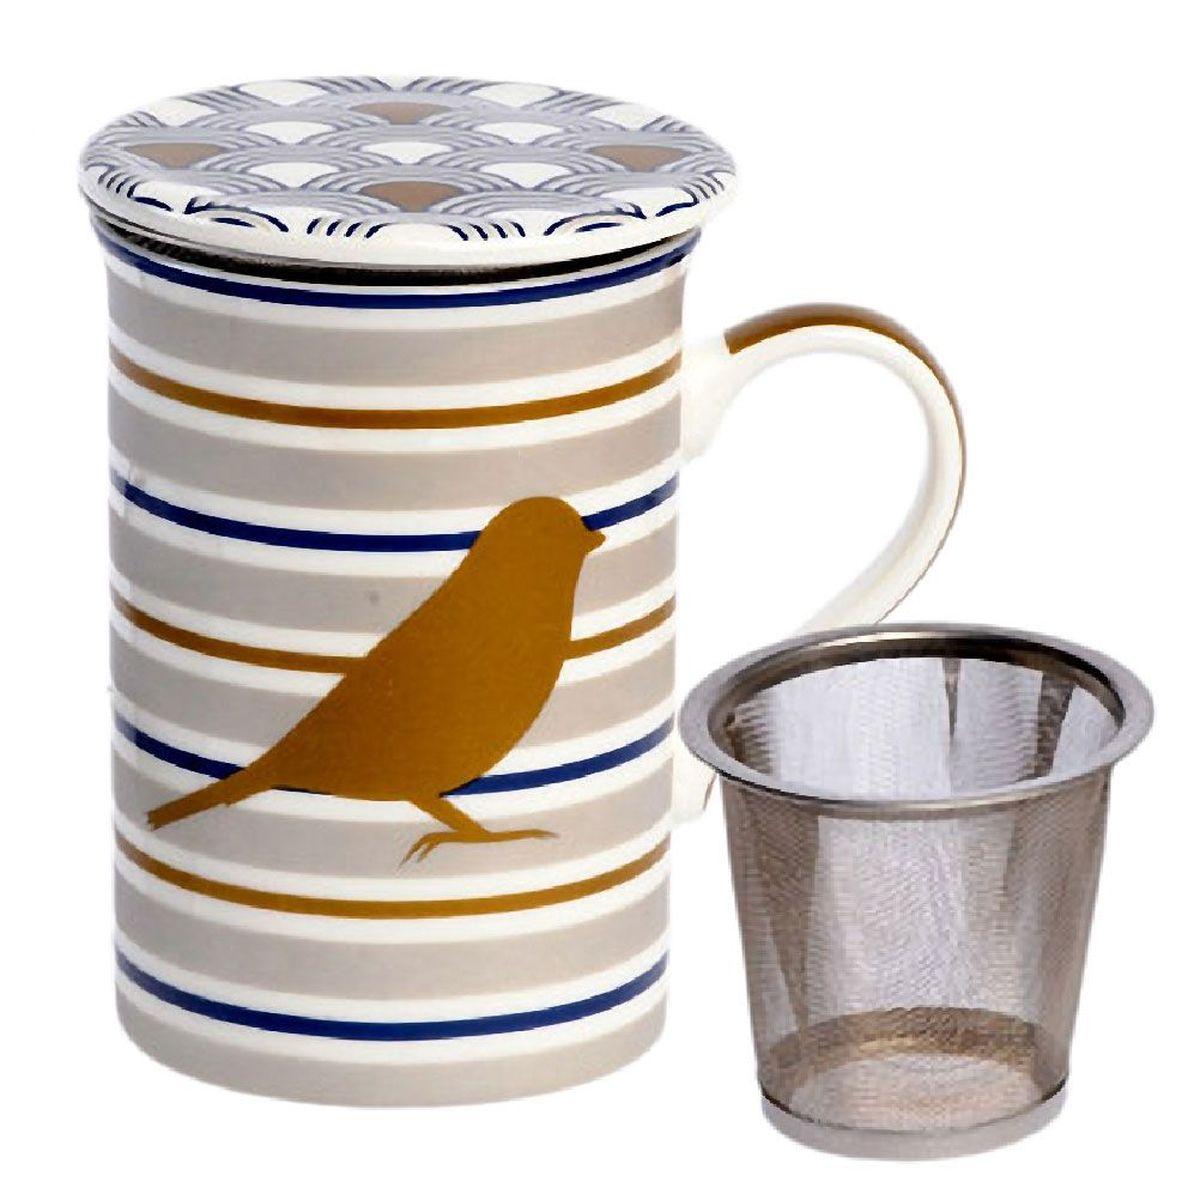 tisani re d co mug vaisselle tasse cadeau cuisine tisani re oiseau or avec infuseur m tal. Black Bedroom Furniture Sets. Home Design Ideas